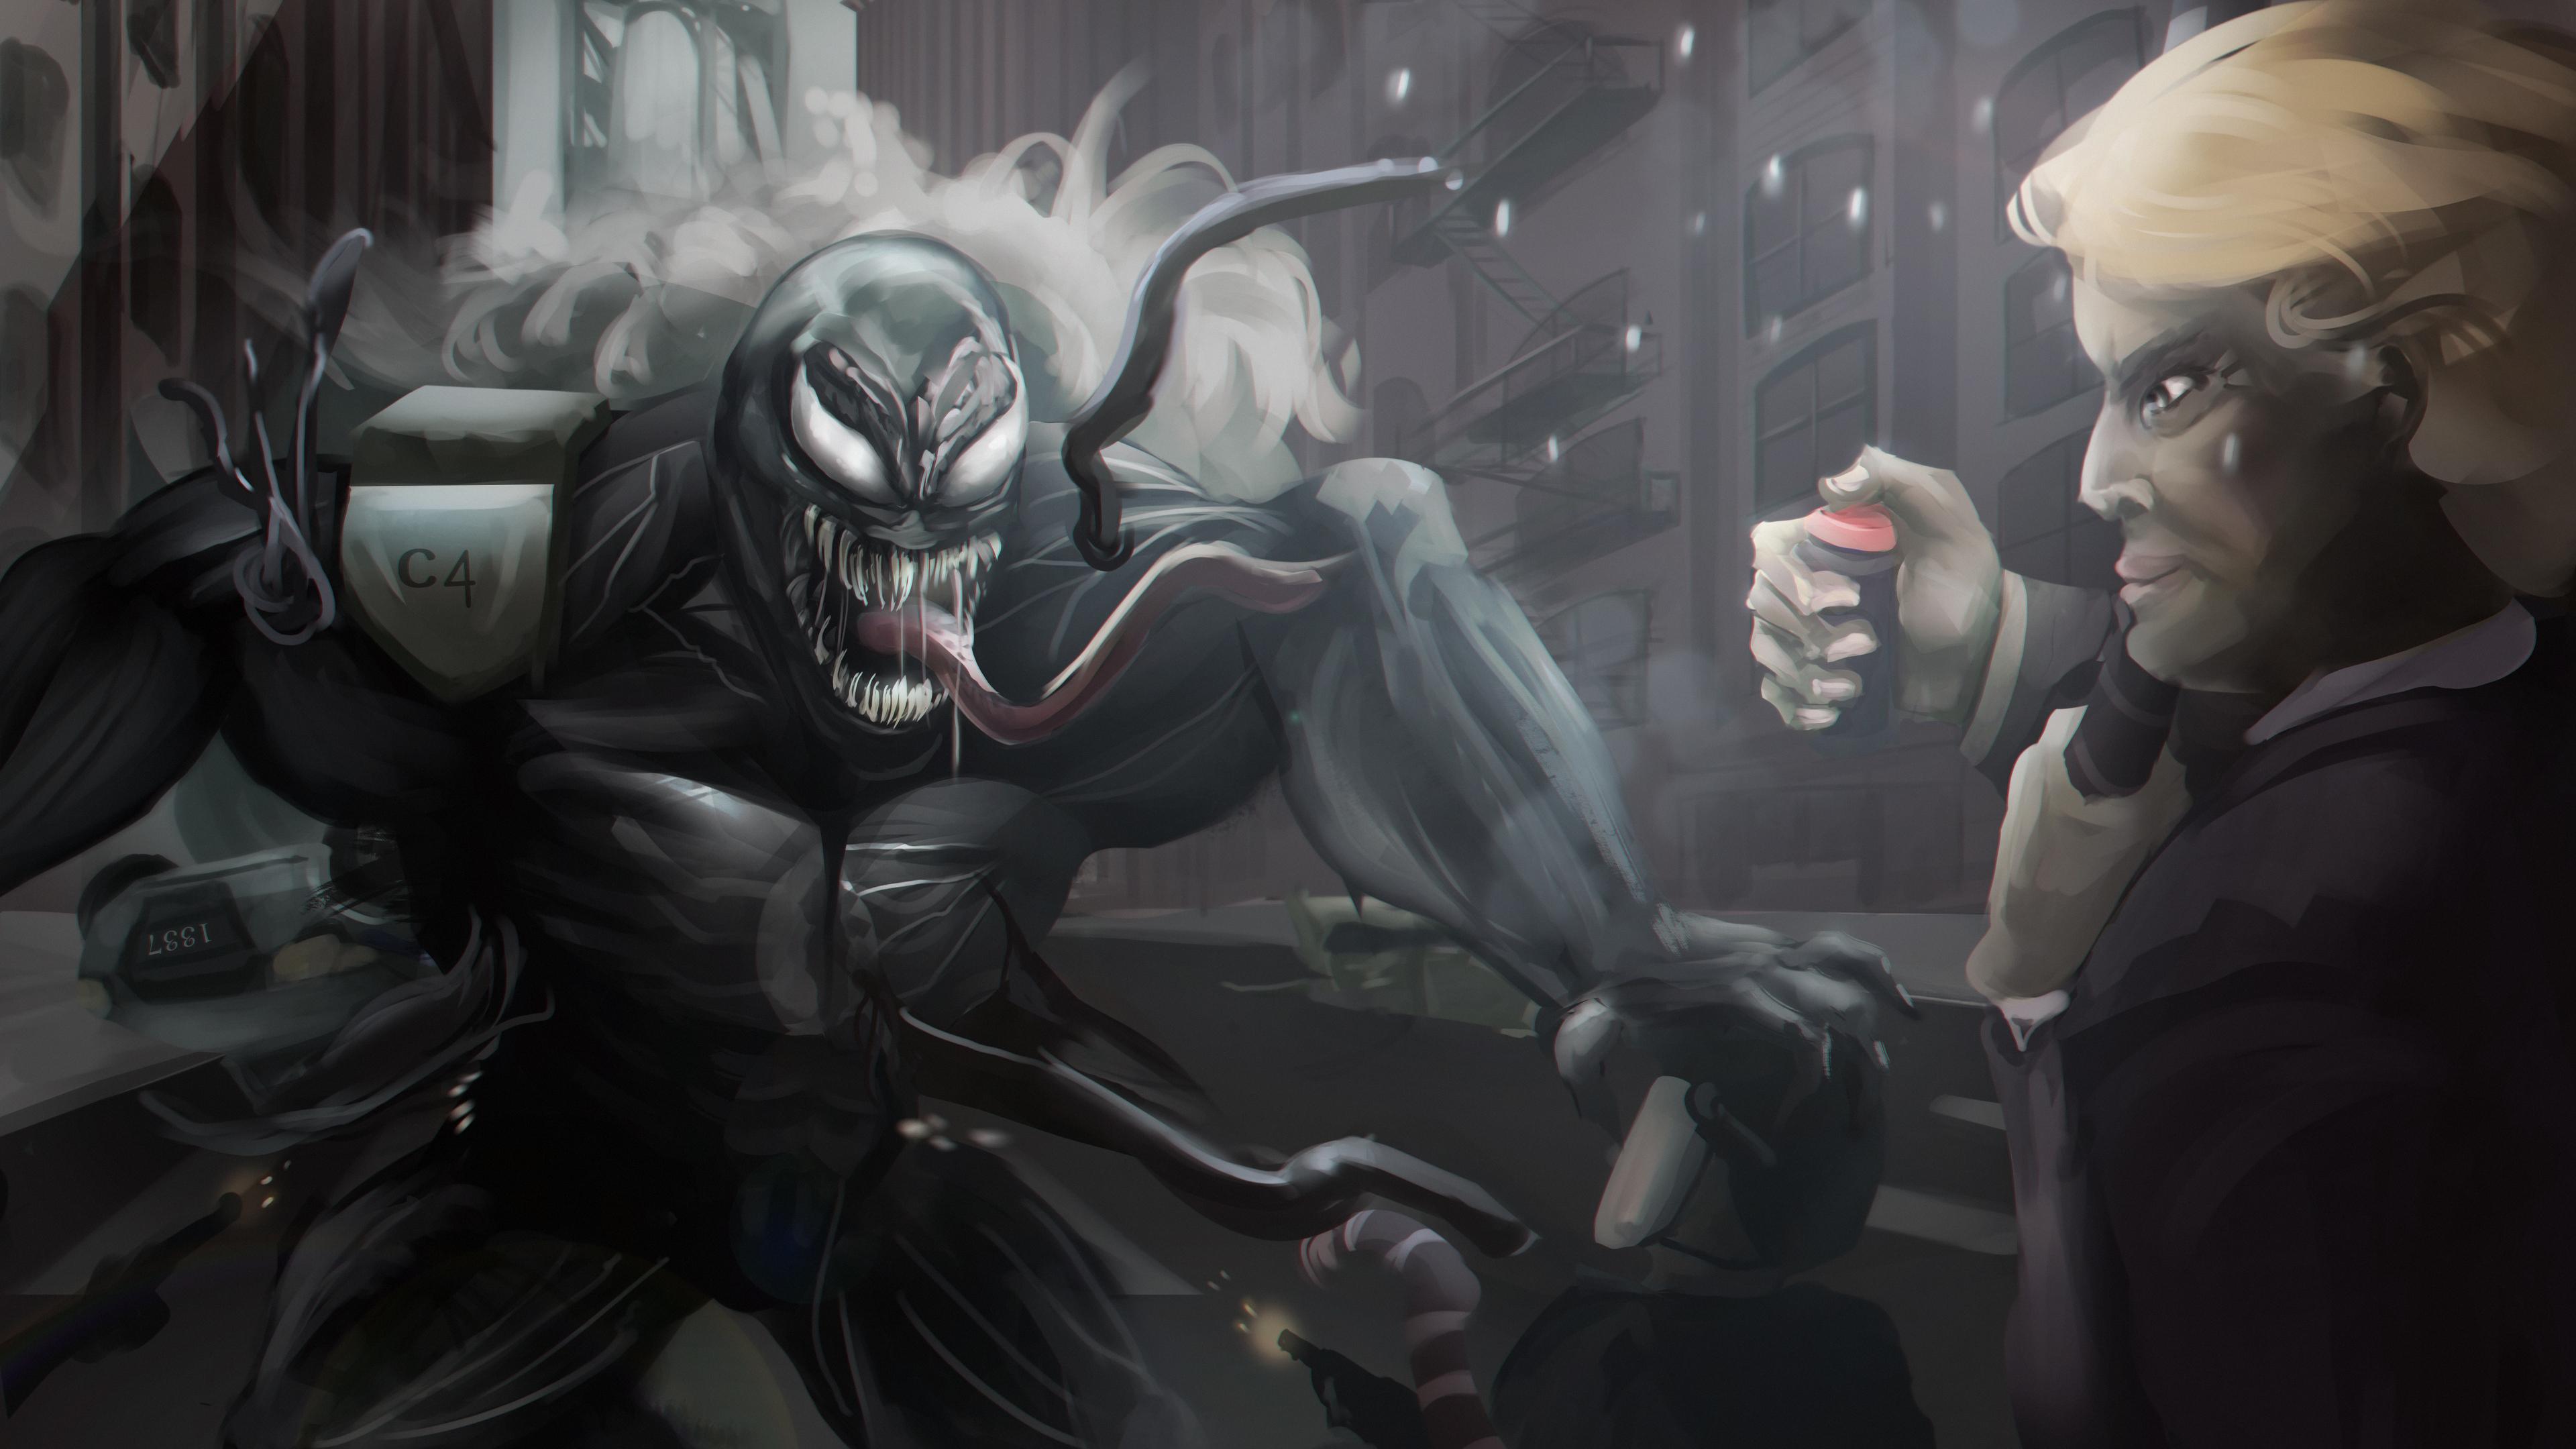 venom digital artwork 5k 1539452763 - Venom Digital Artwork 5k - Venom wallpapers, venom movie wallpapers, superheroes wallpapers, hd-wallpapers, digital art wallpapers, deviantart wallpapers, artwork wallpapers, 5k wallpapers, 4k-wallpapers